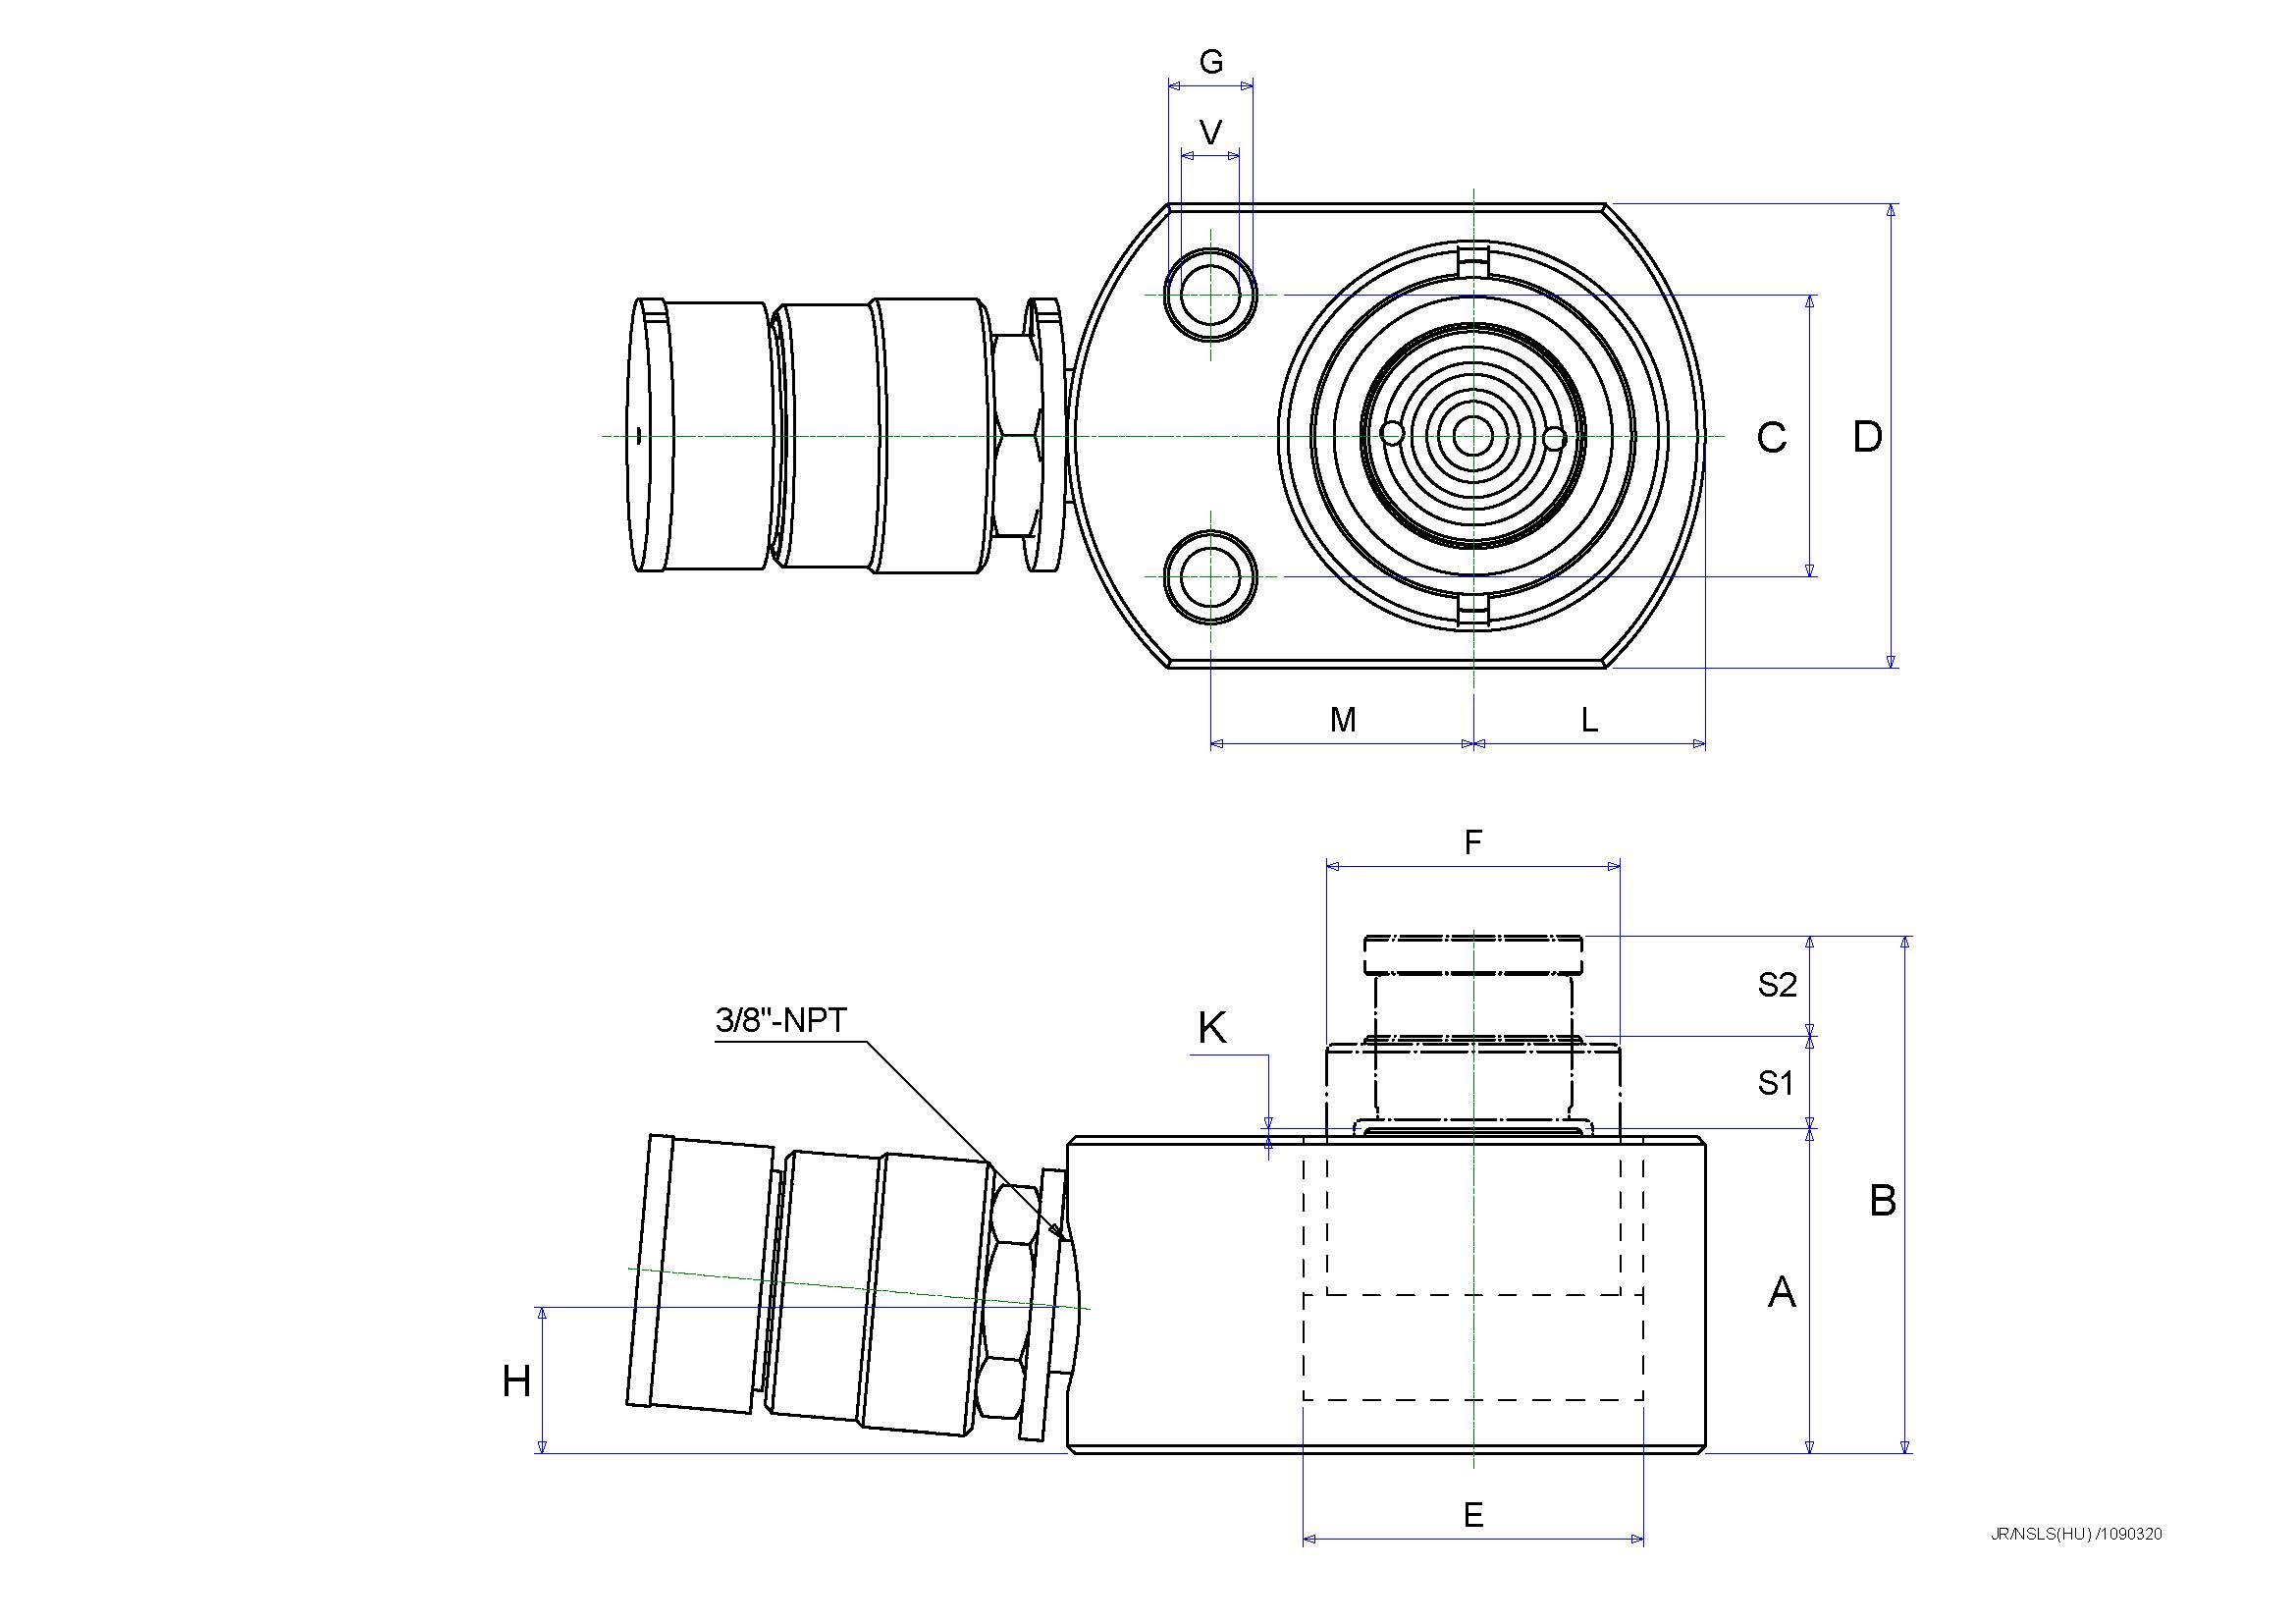 proimages/0530/Drawaing/P12_-_NSLS10-05N_(HU).jpg